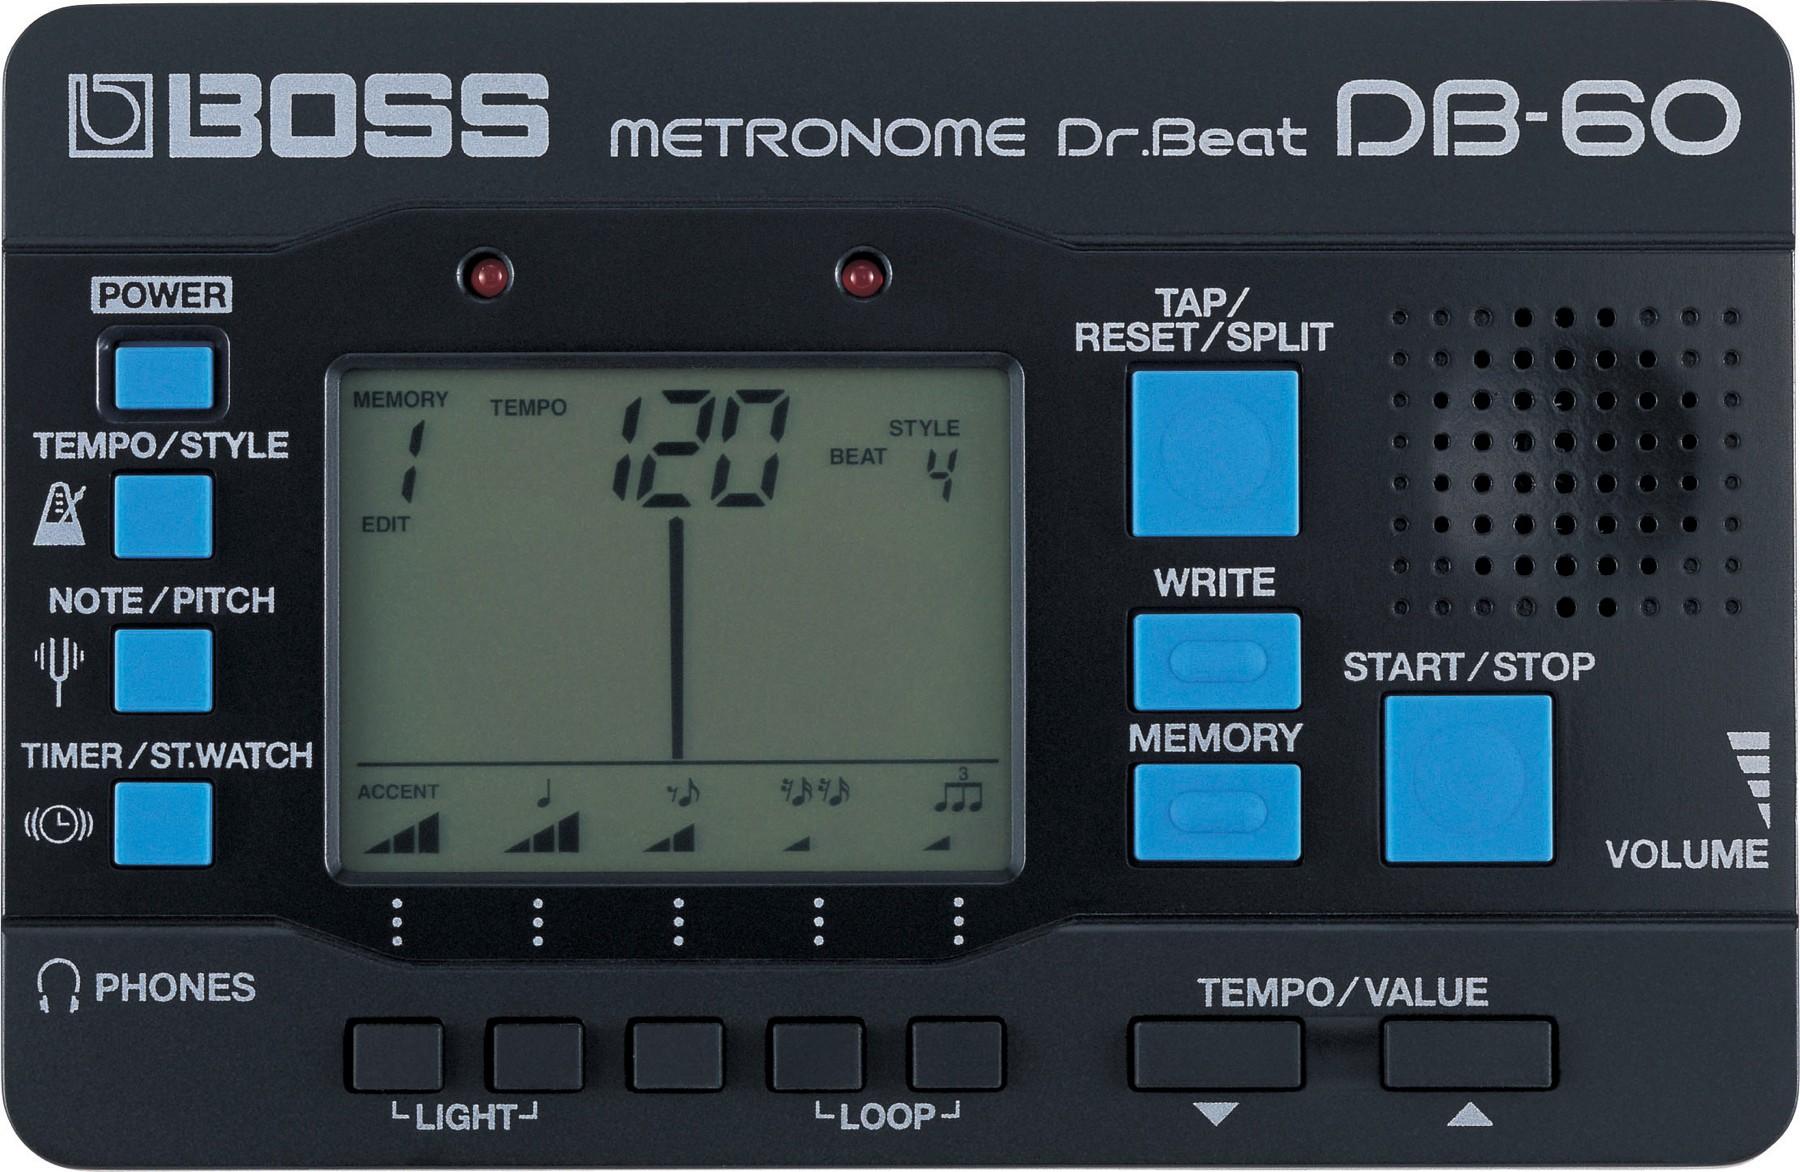 db 60 dr beat boss db 60 dr beat audiofanzine. Black Bedroom Furniture Sets. Home Design Ideas